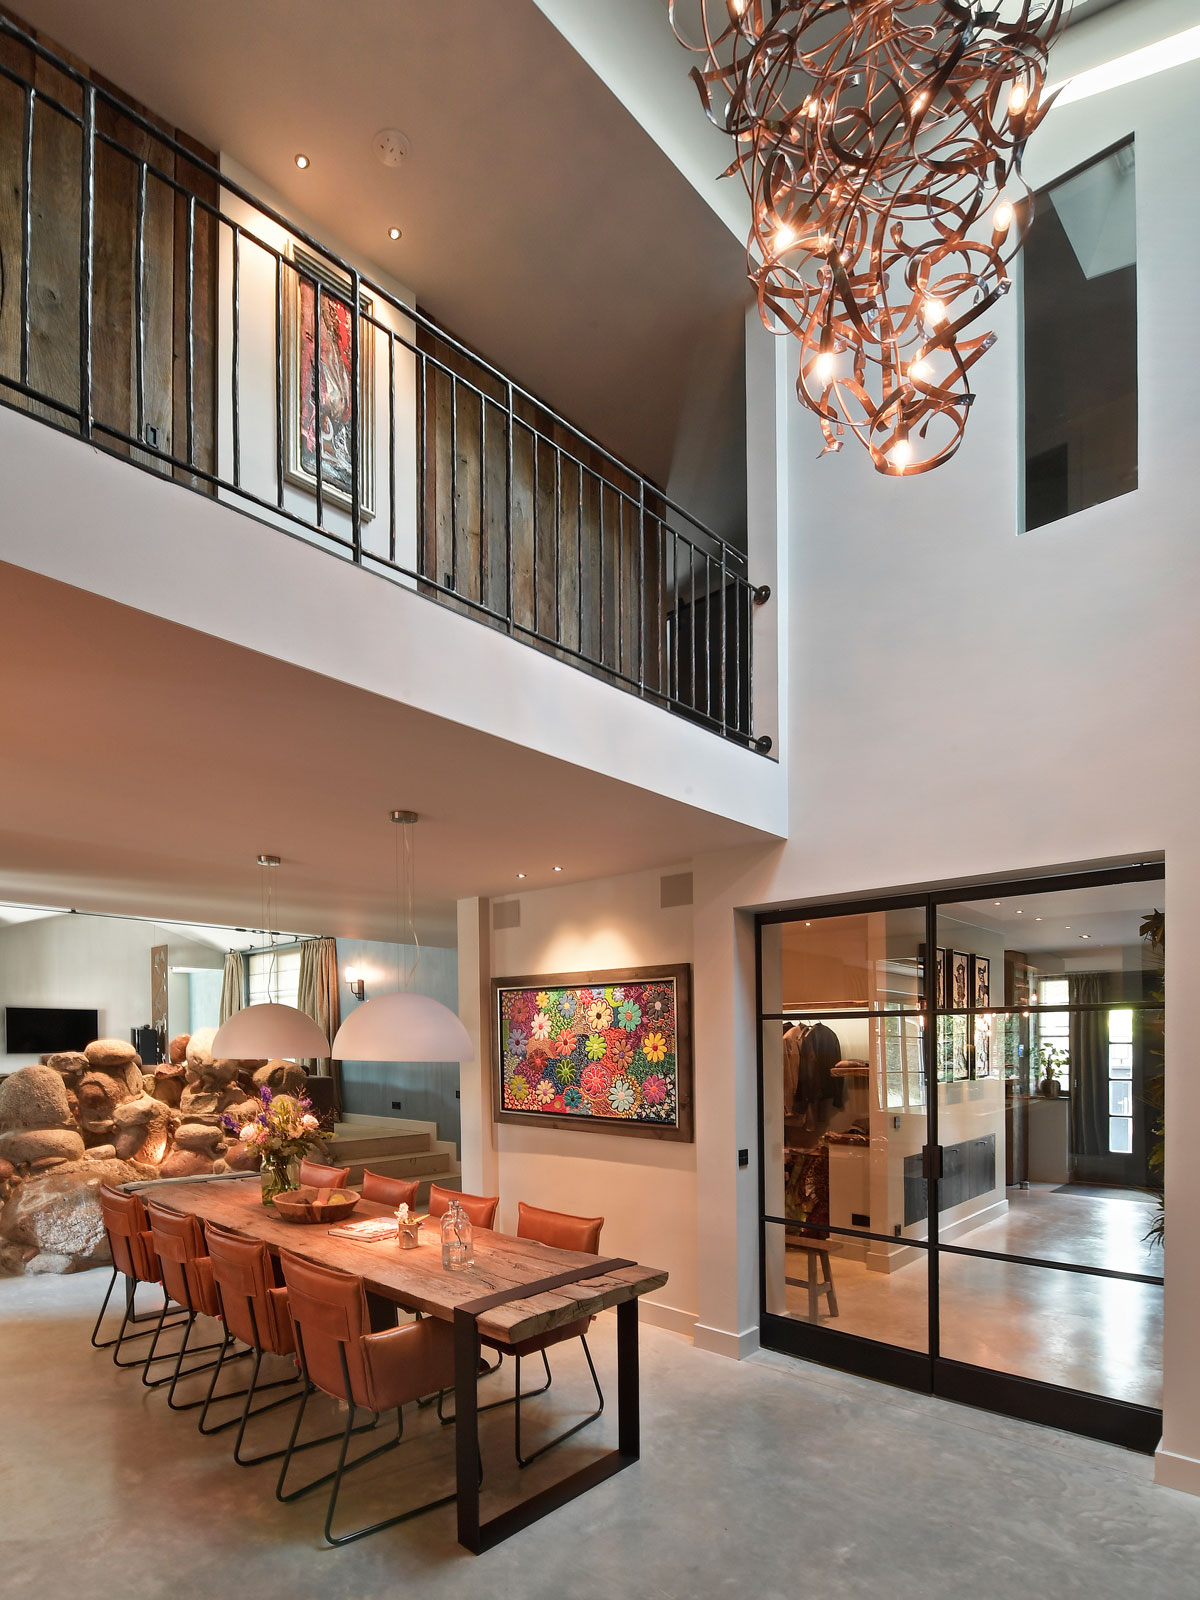 luxe trap, van bruchem staircases, houten trap, exclusieve trappen